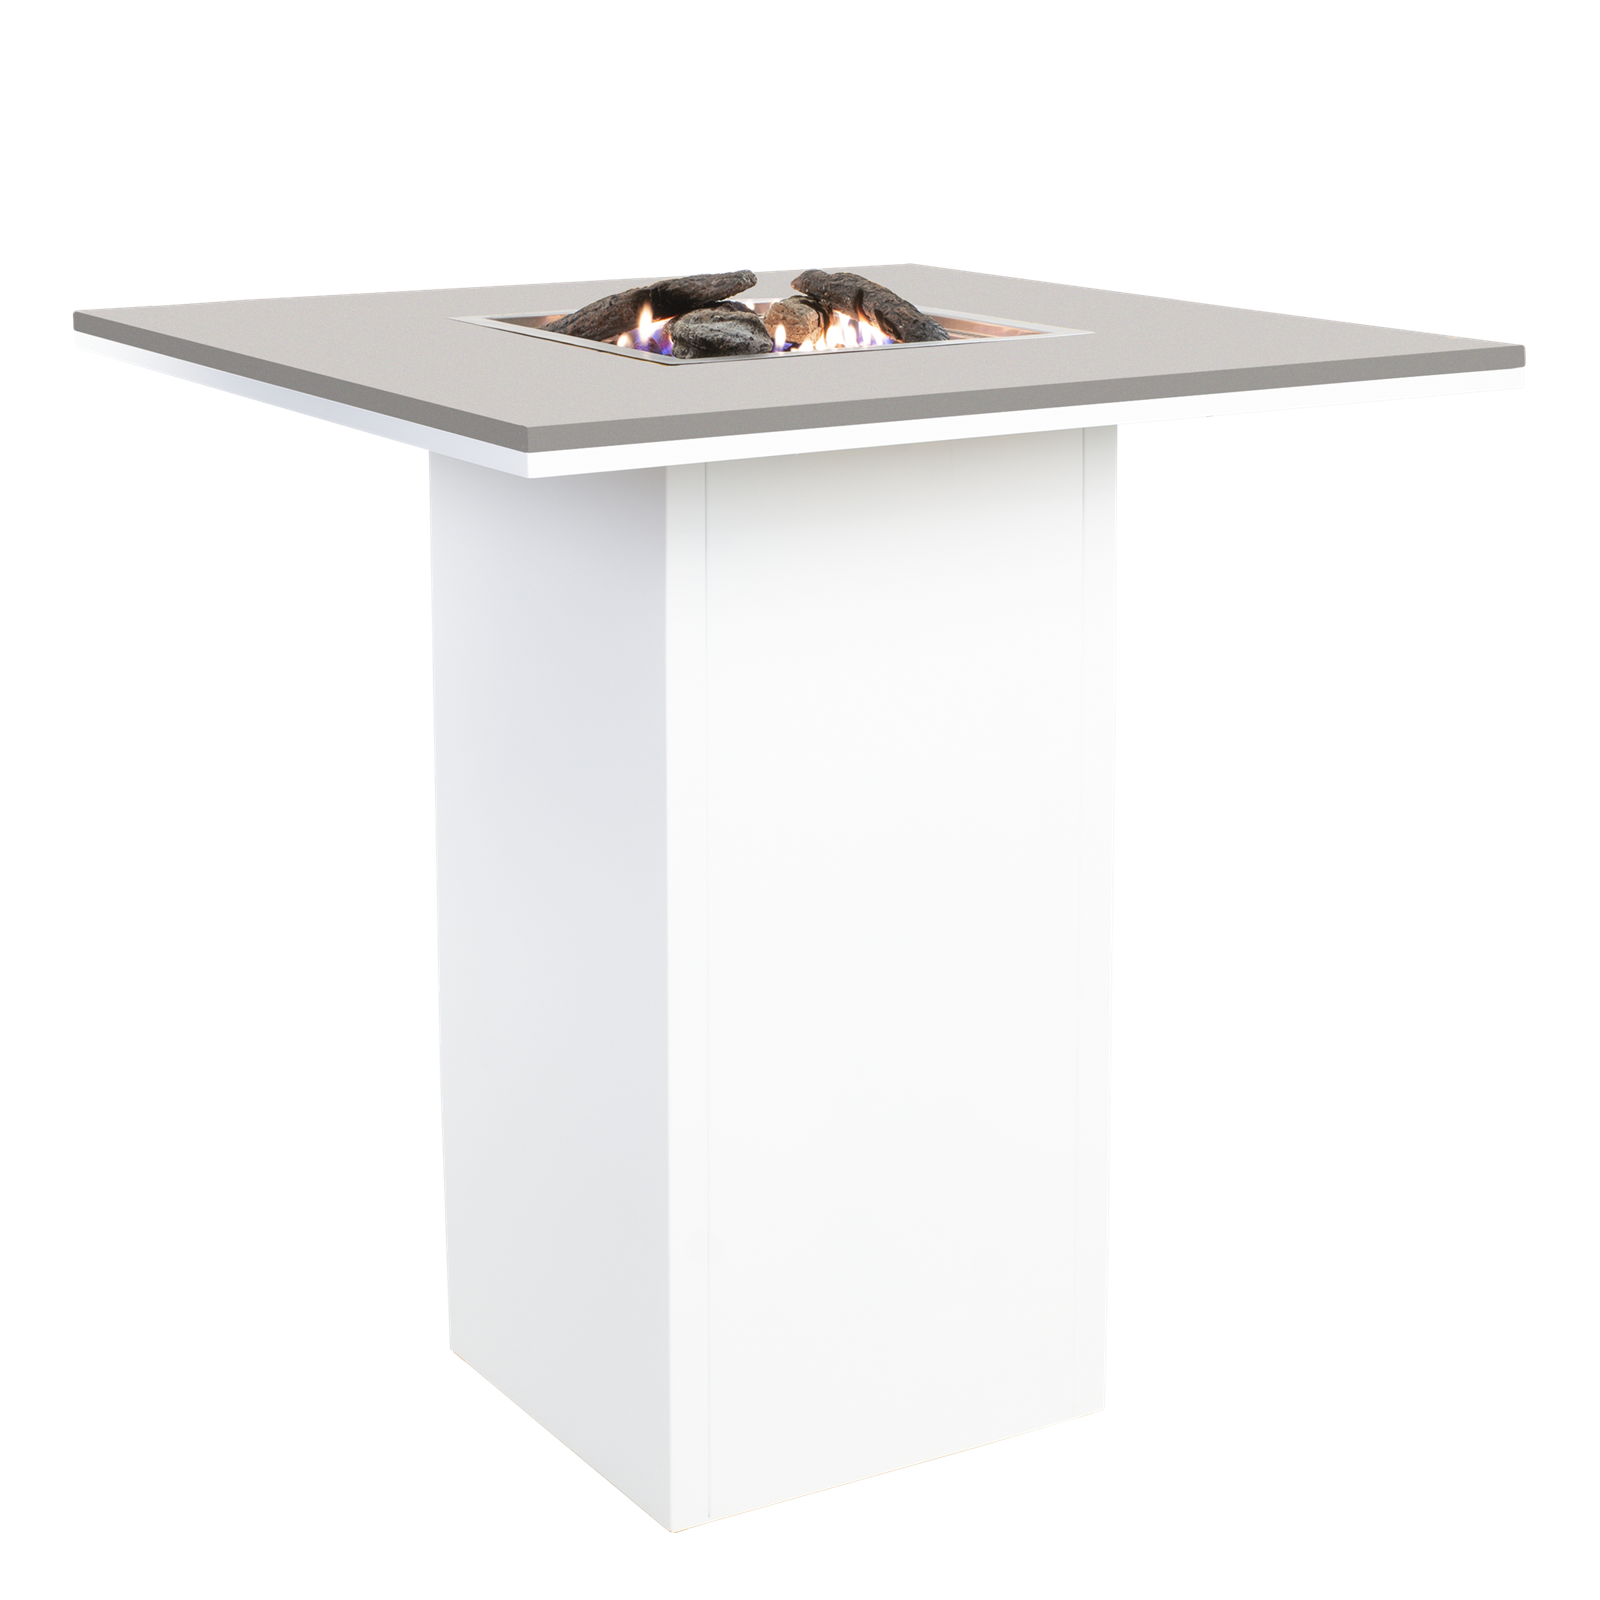 Cosi Fires vuurtafels en gaslantaarns Cosi Fires bartafel/vuurtafel Cosiloft Simple, white frame, grey top, afm. 100 x 100 x 105